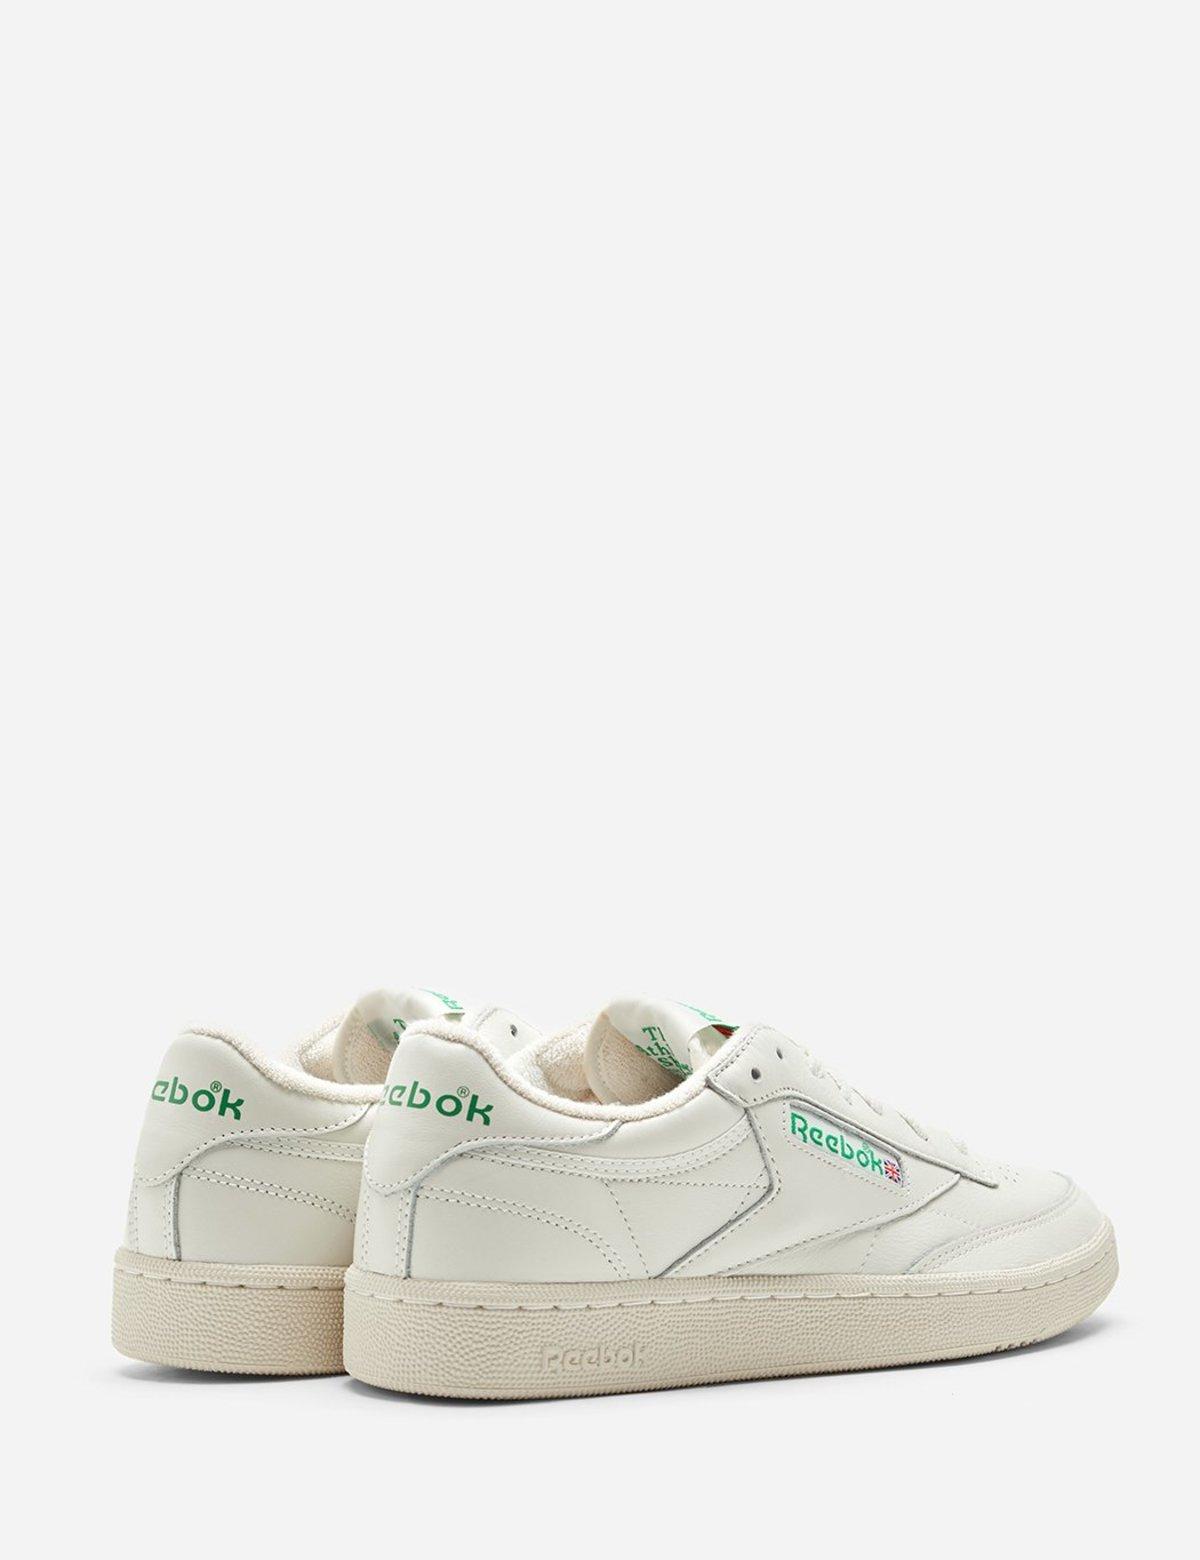 5468e0a0 Reebok Club C 1985 Trainers - Chalk/Paper White/Green | Garmentory